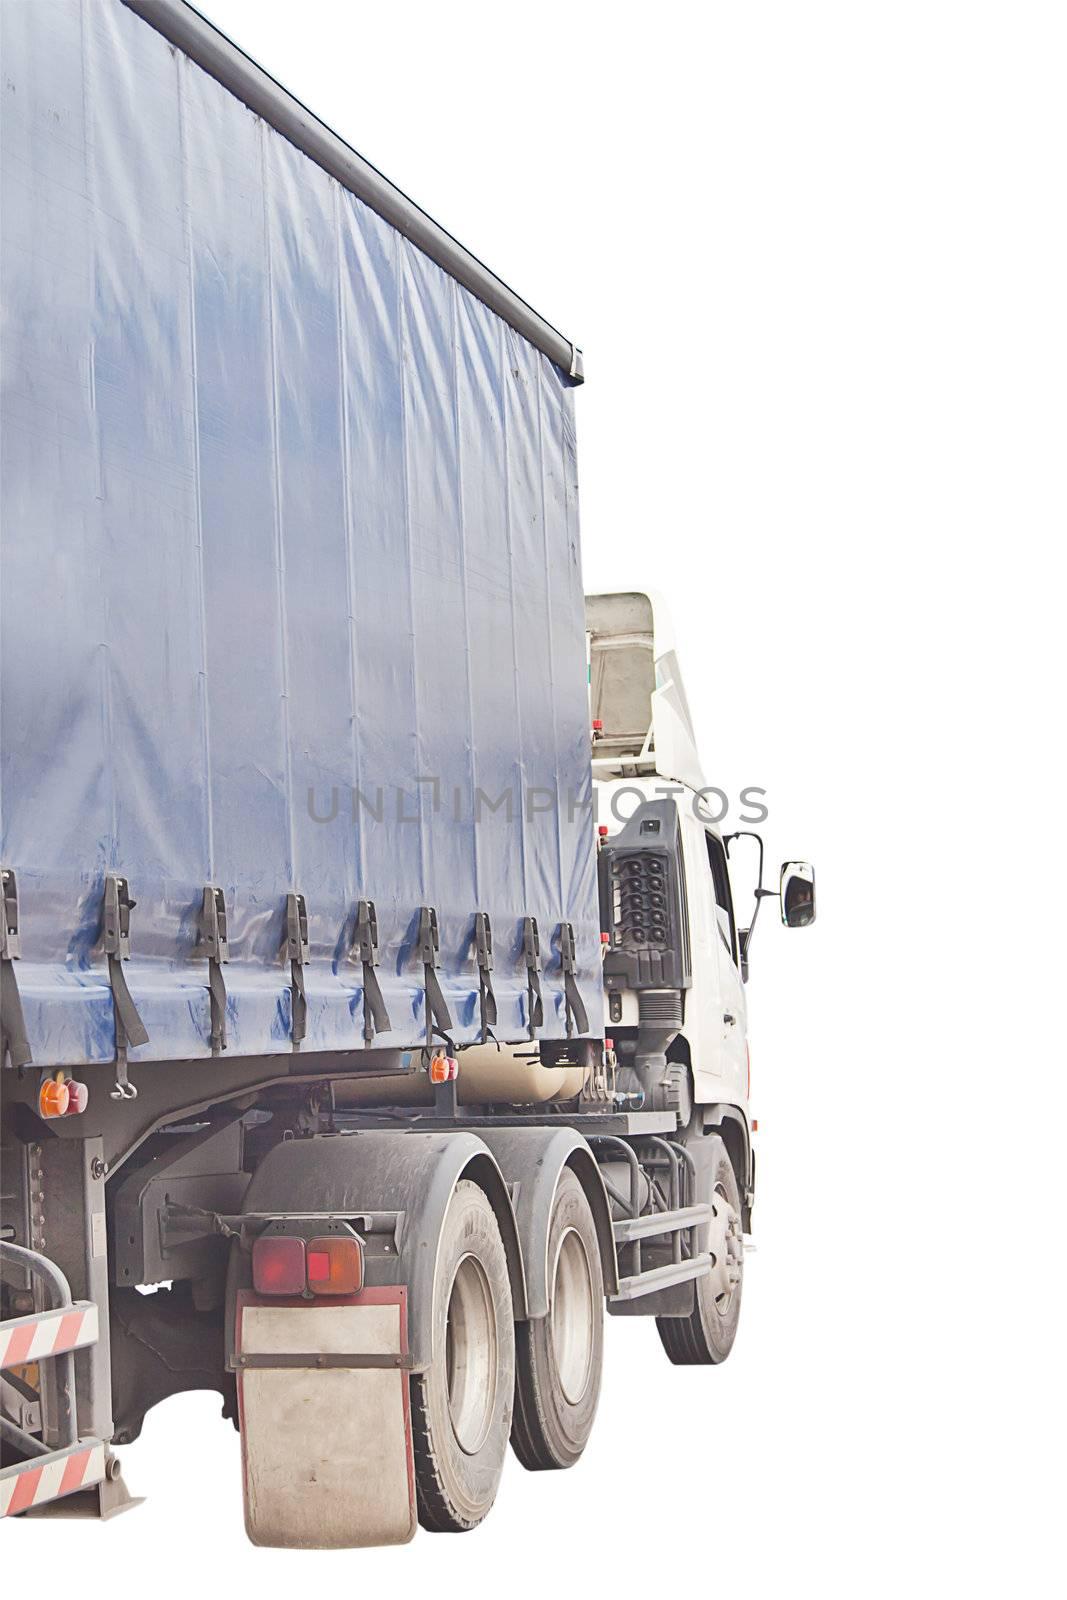 Car, Truck for transportation